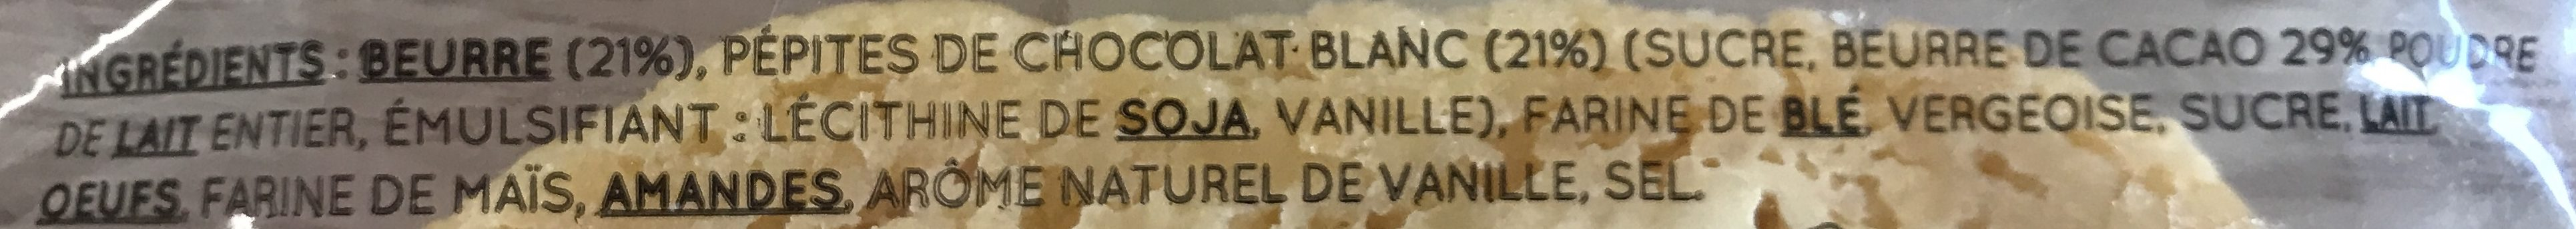 Cookie chocolat blanc - Ingrédients